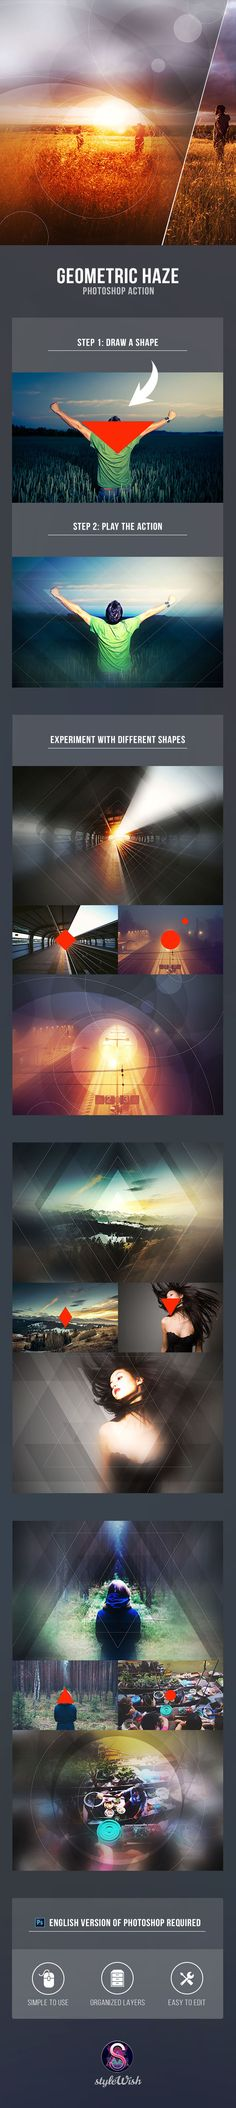 Geometric Haze Photoshop Action - Photo Effects Actions